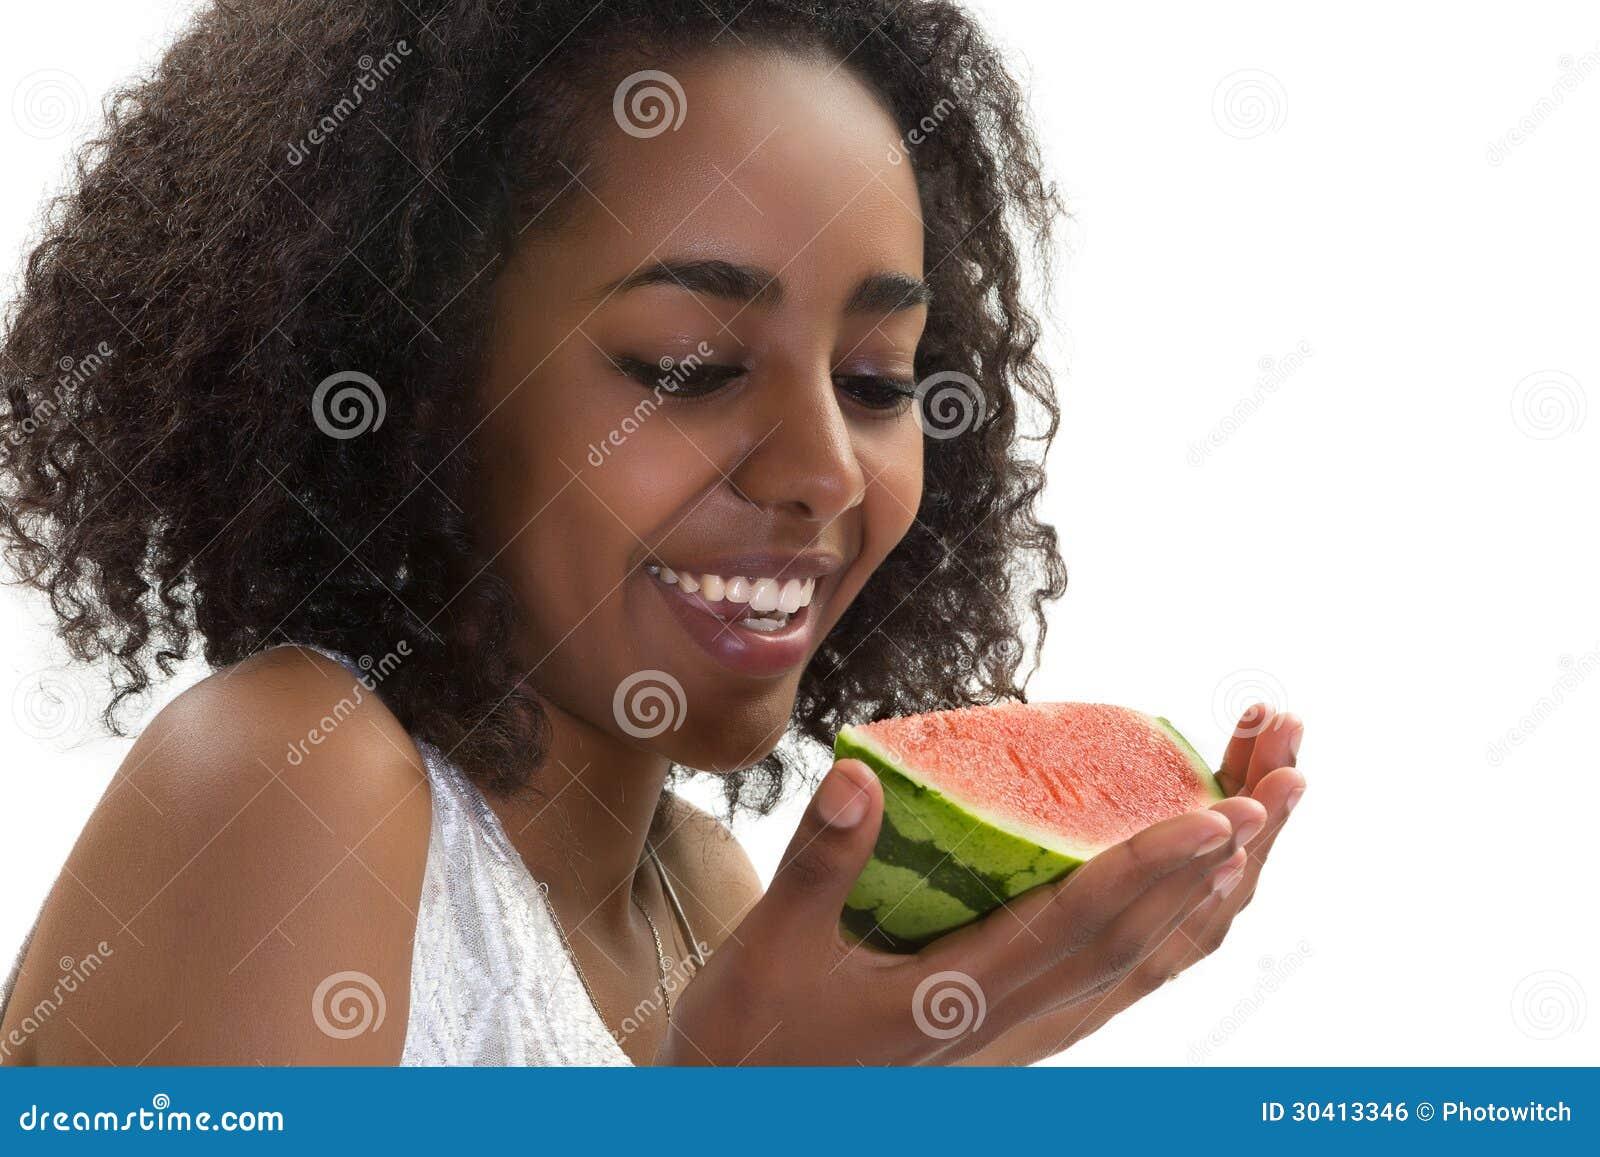 girls fucking with fruits